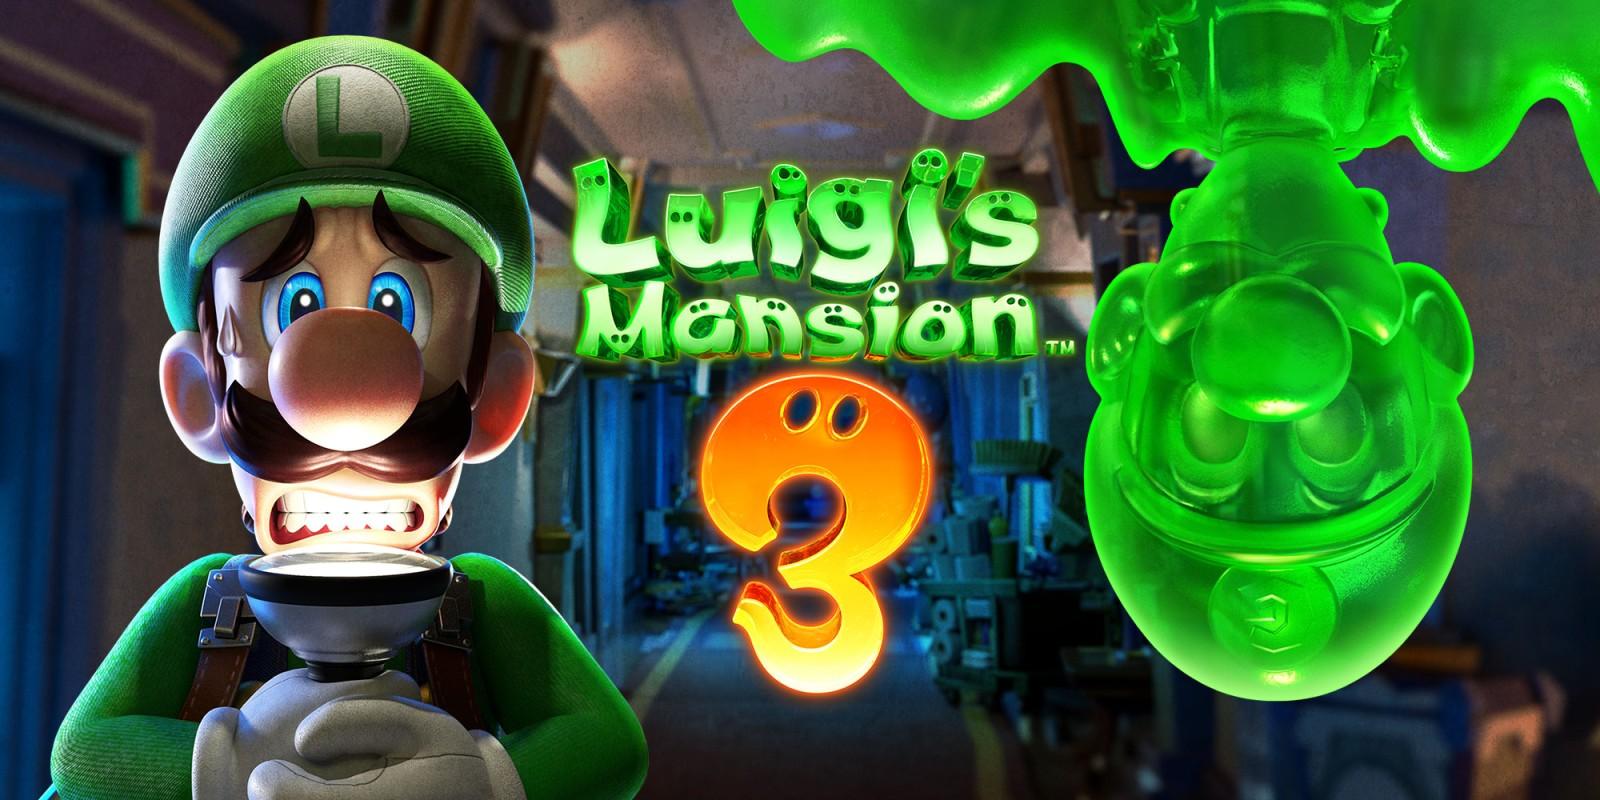 Today's Best Game Deals: Luigi's Mansion 3 $42, Link's Awakening $42, more